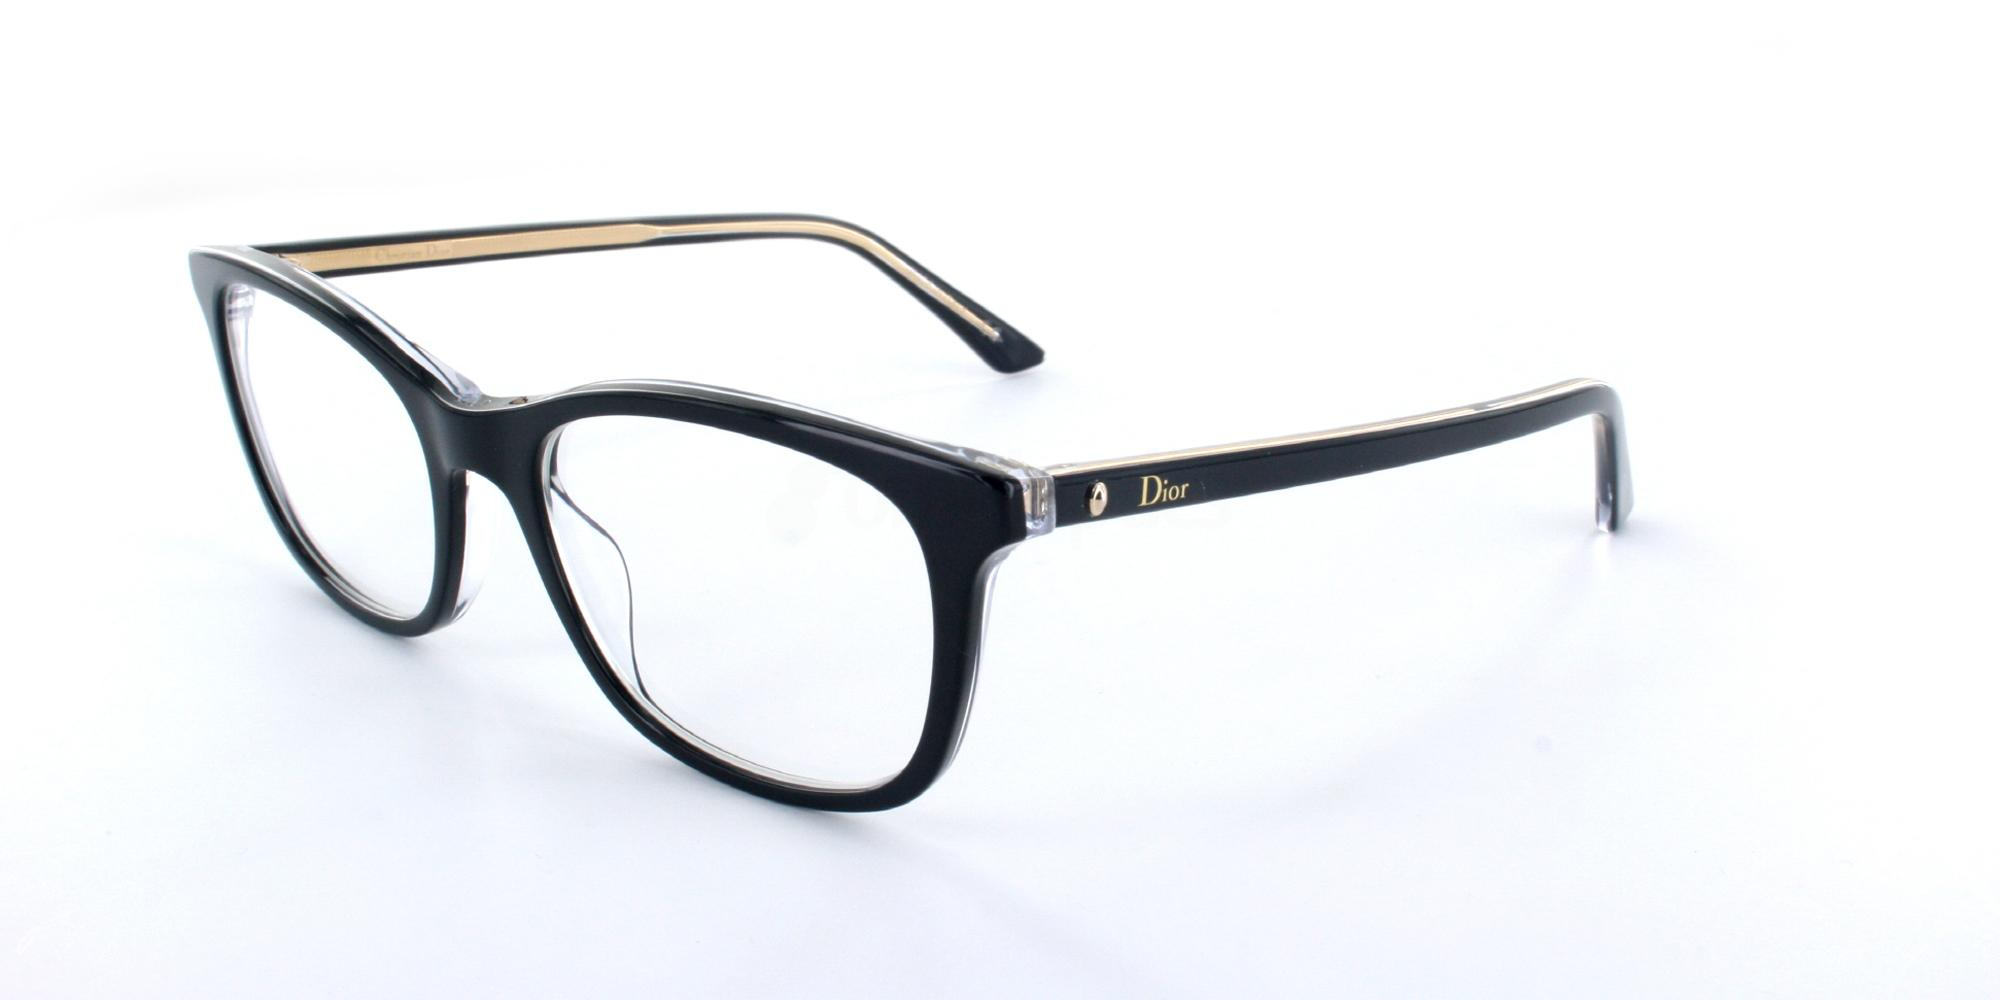 G99 MONTAIGNE18 Glasses, Christian Dior